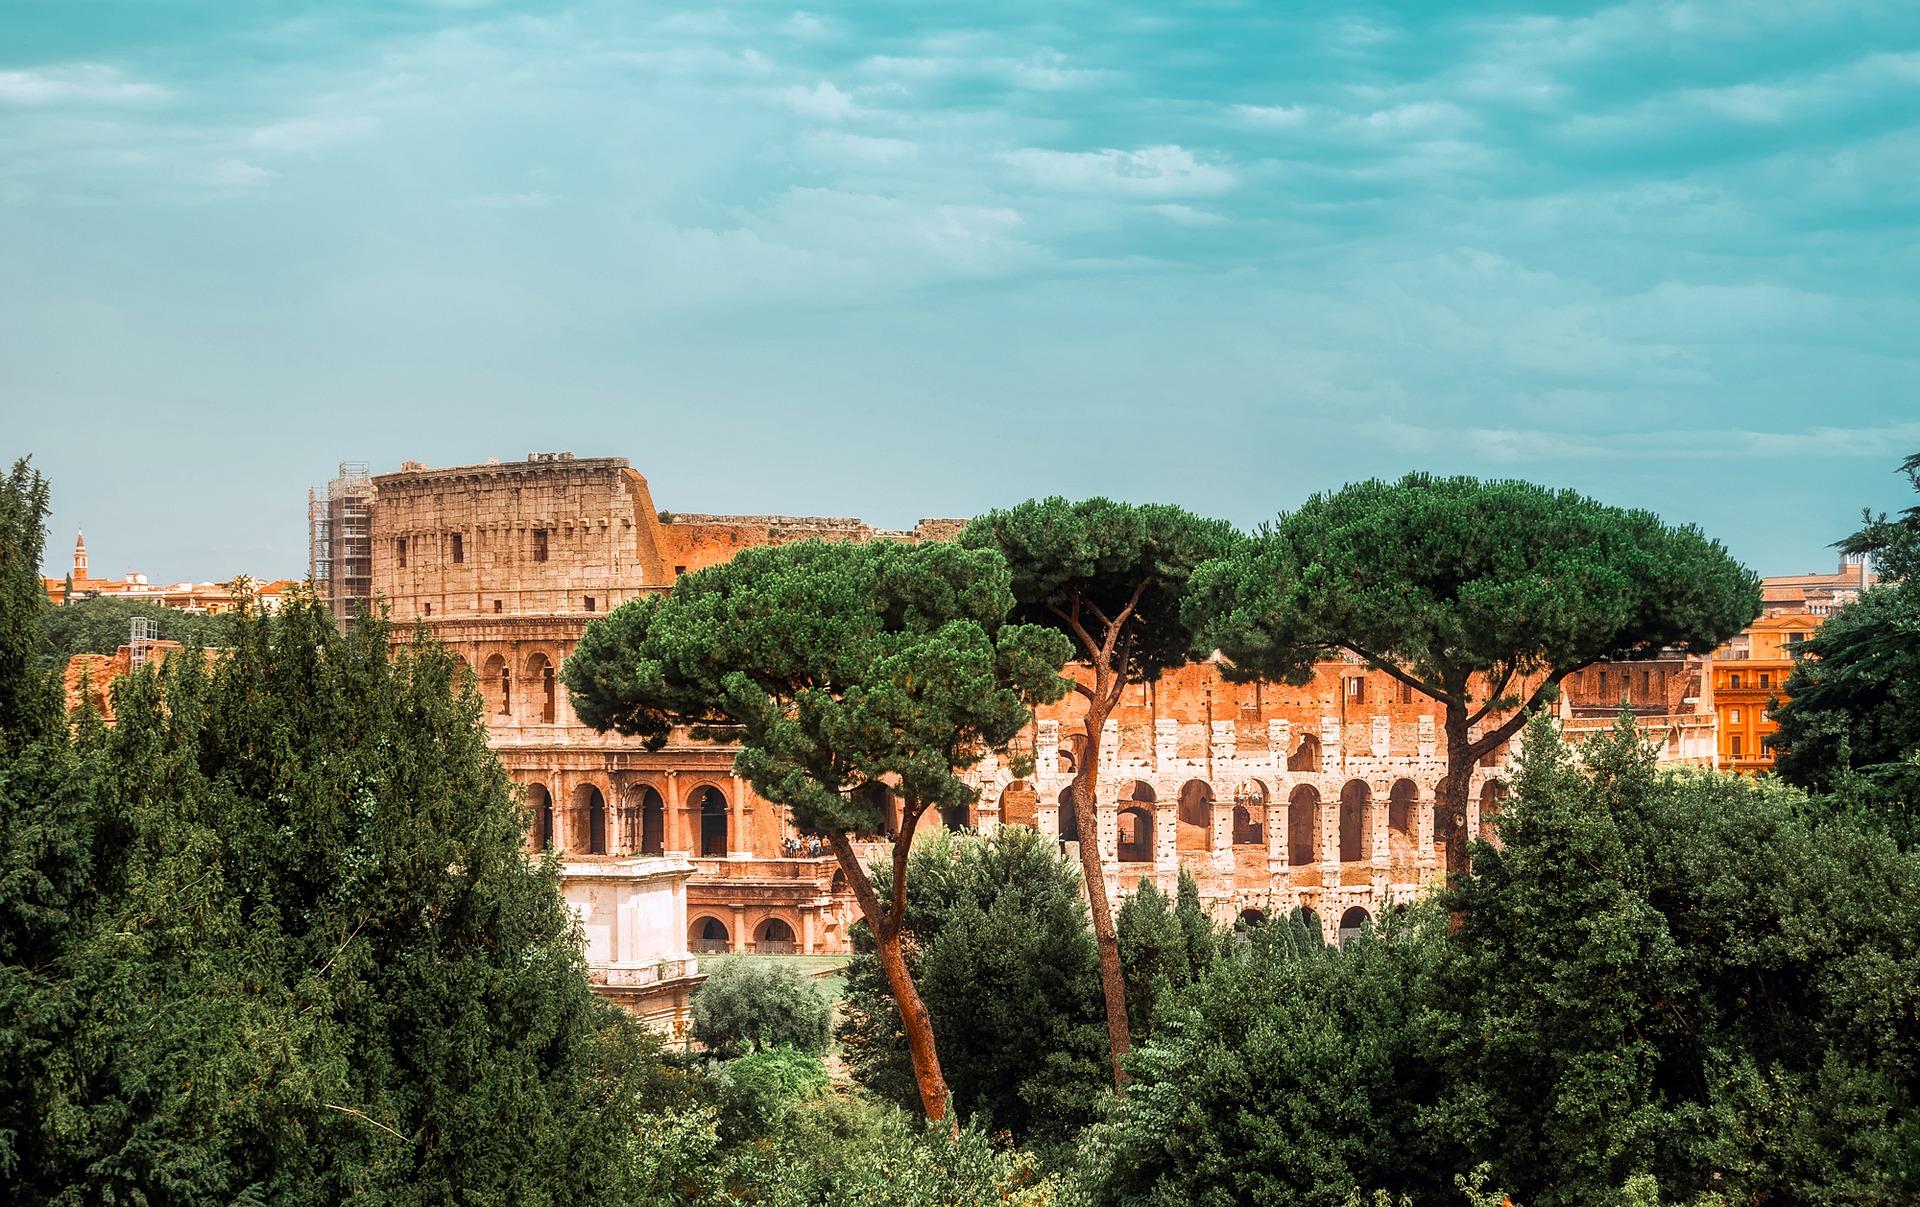 Historic Landmark view on Colosseum Rome, Italy